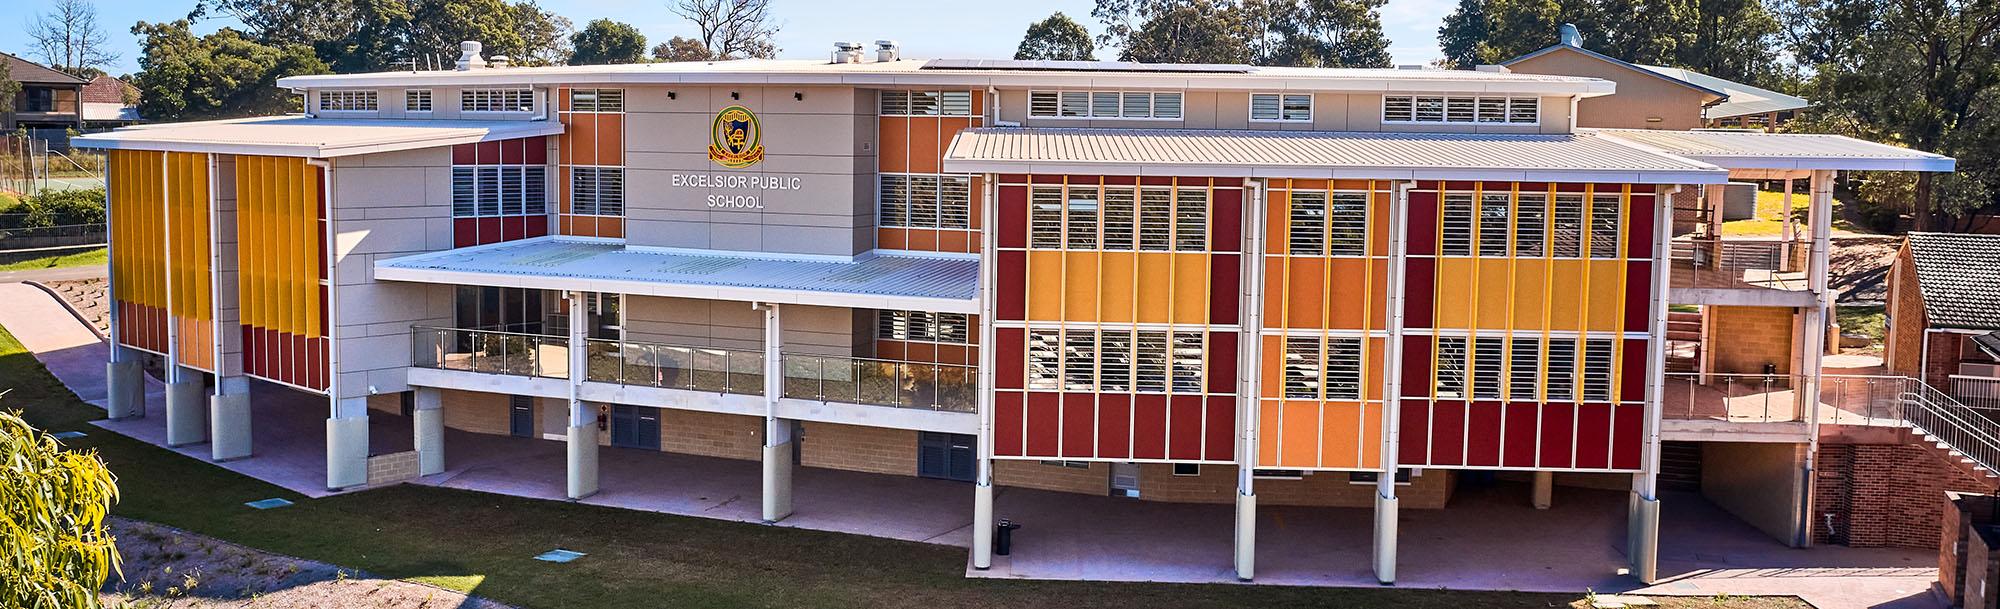 Excelsior Public School Architecture Exterior Panorama – Gardner Wetherill GW 9